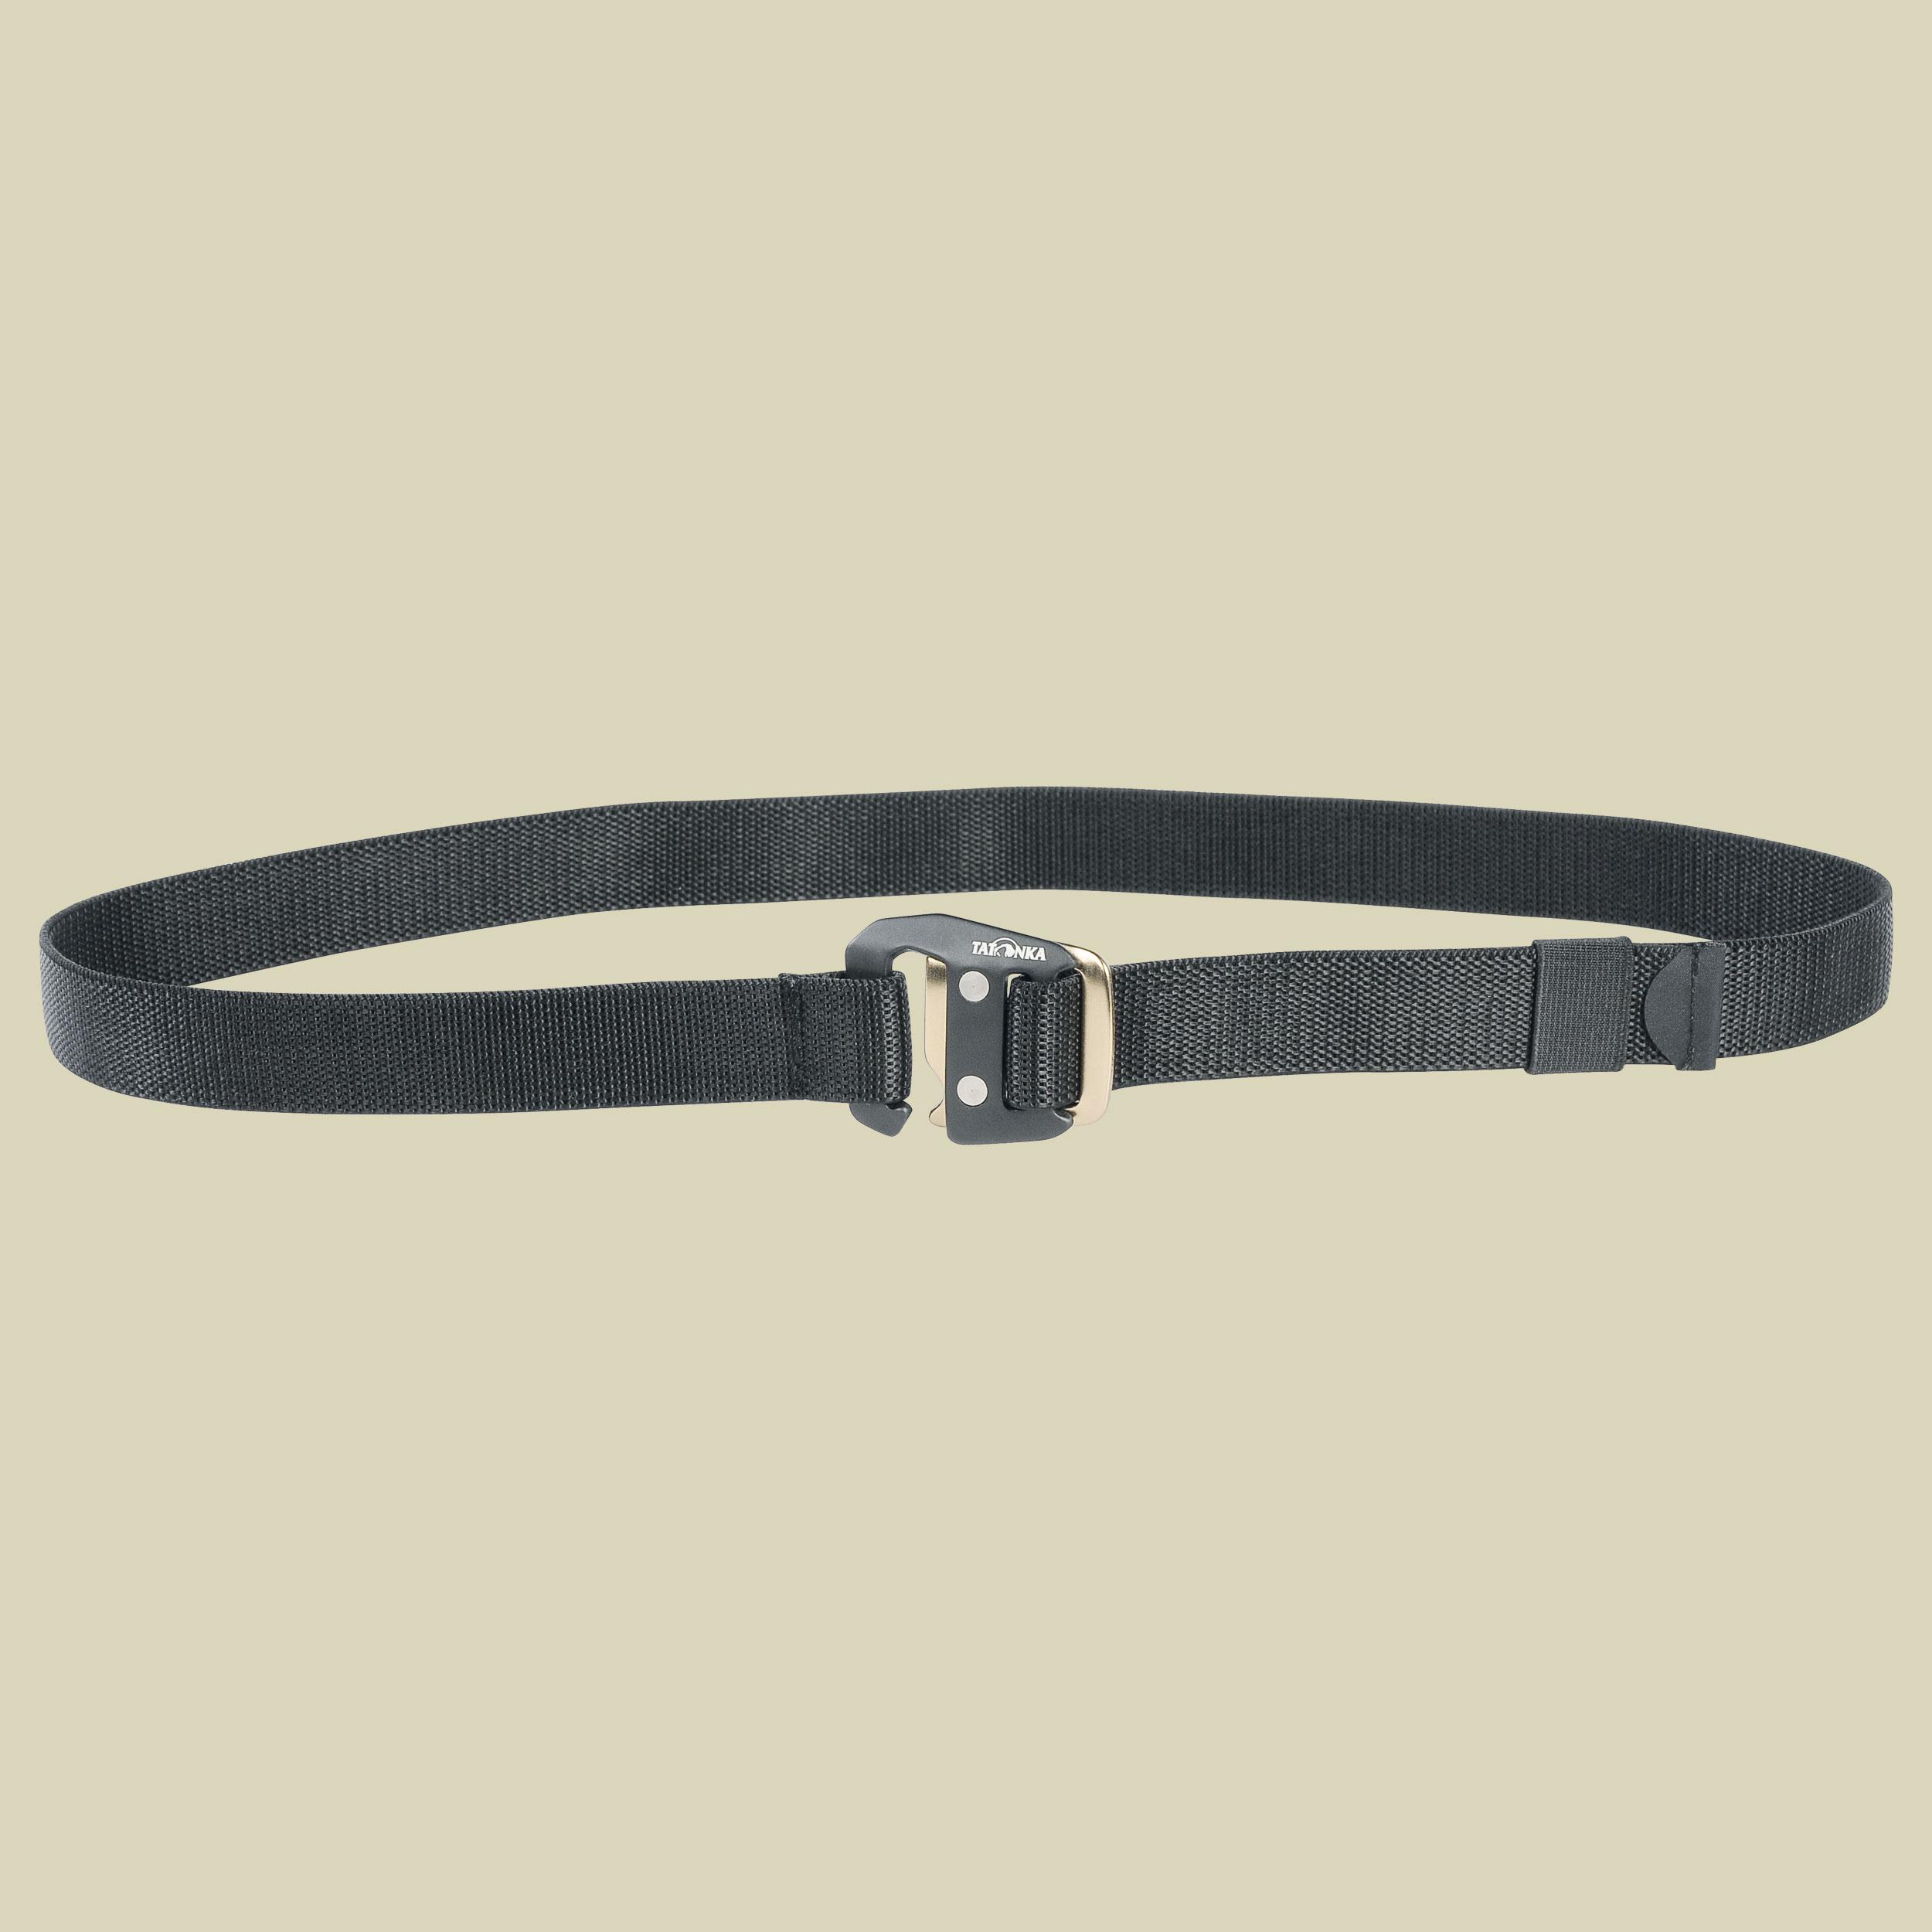 Tatonka Stretch Belt 25mm Gürtel  black